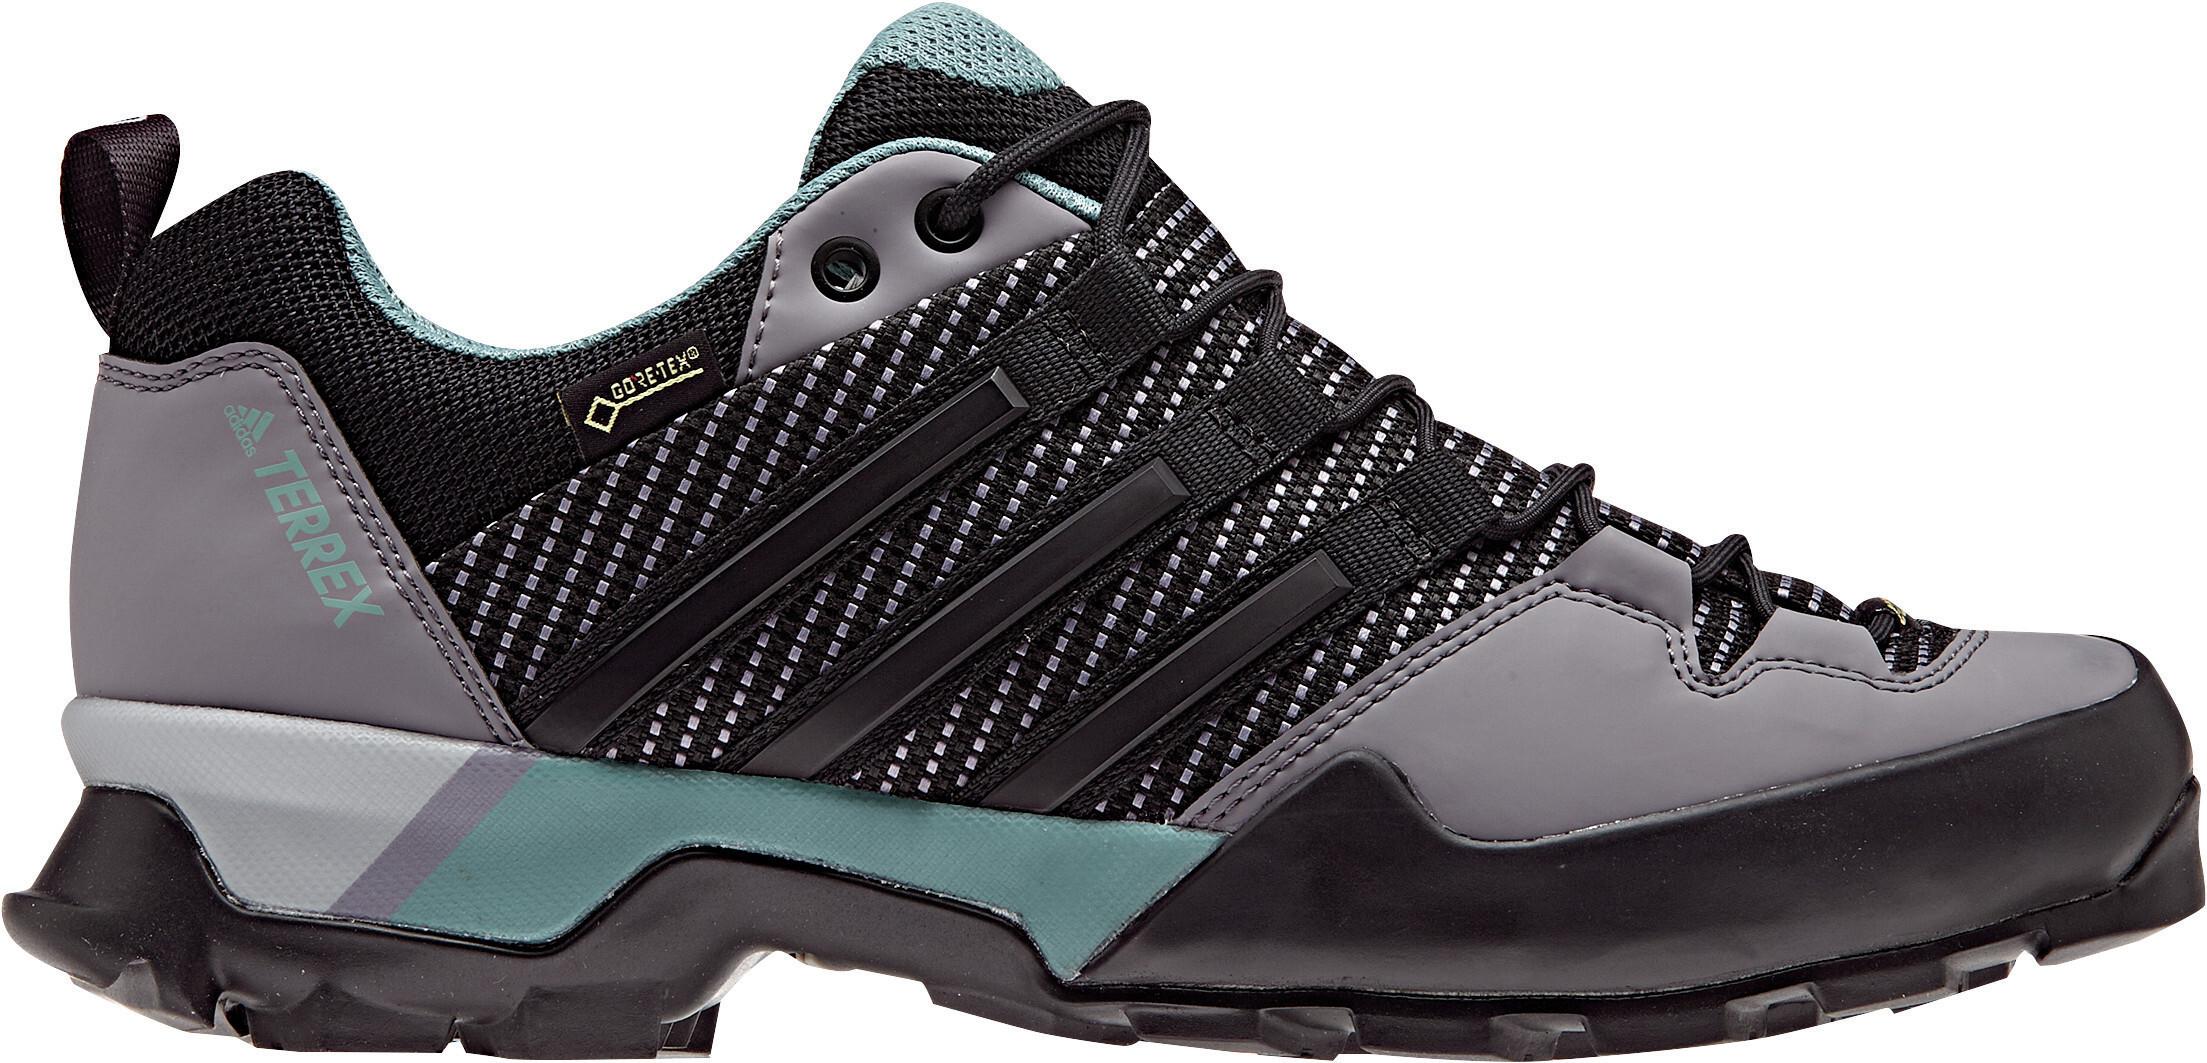 84e61537418 adidas TERREX Scope GTX Shoes Women grey black at Addnature.co.uk